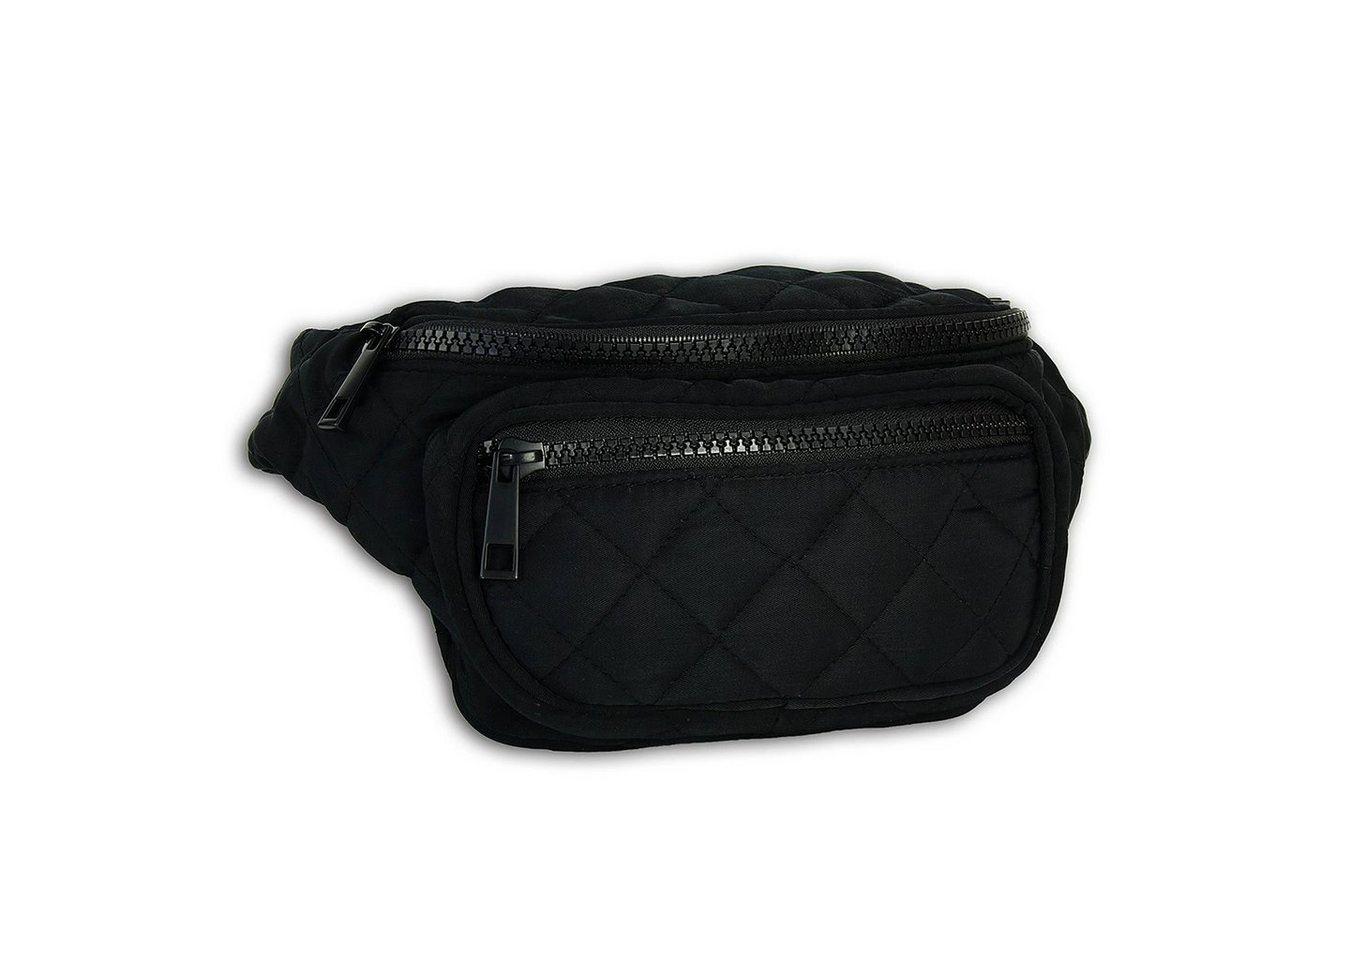 new bags -  Gürteltasche »OTD5026X  Damen Hüfttasche Gürteltasche« (Gürteltasche), Damen, Jugend Tasche schwarz, ca. 24cm x ca. 10cm